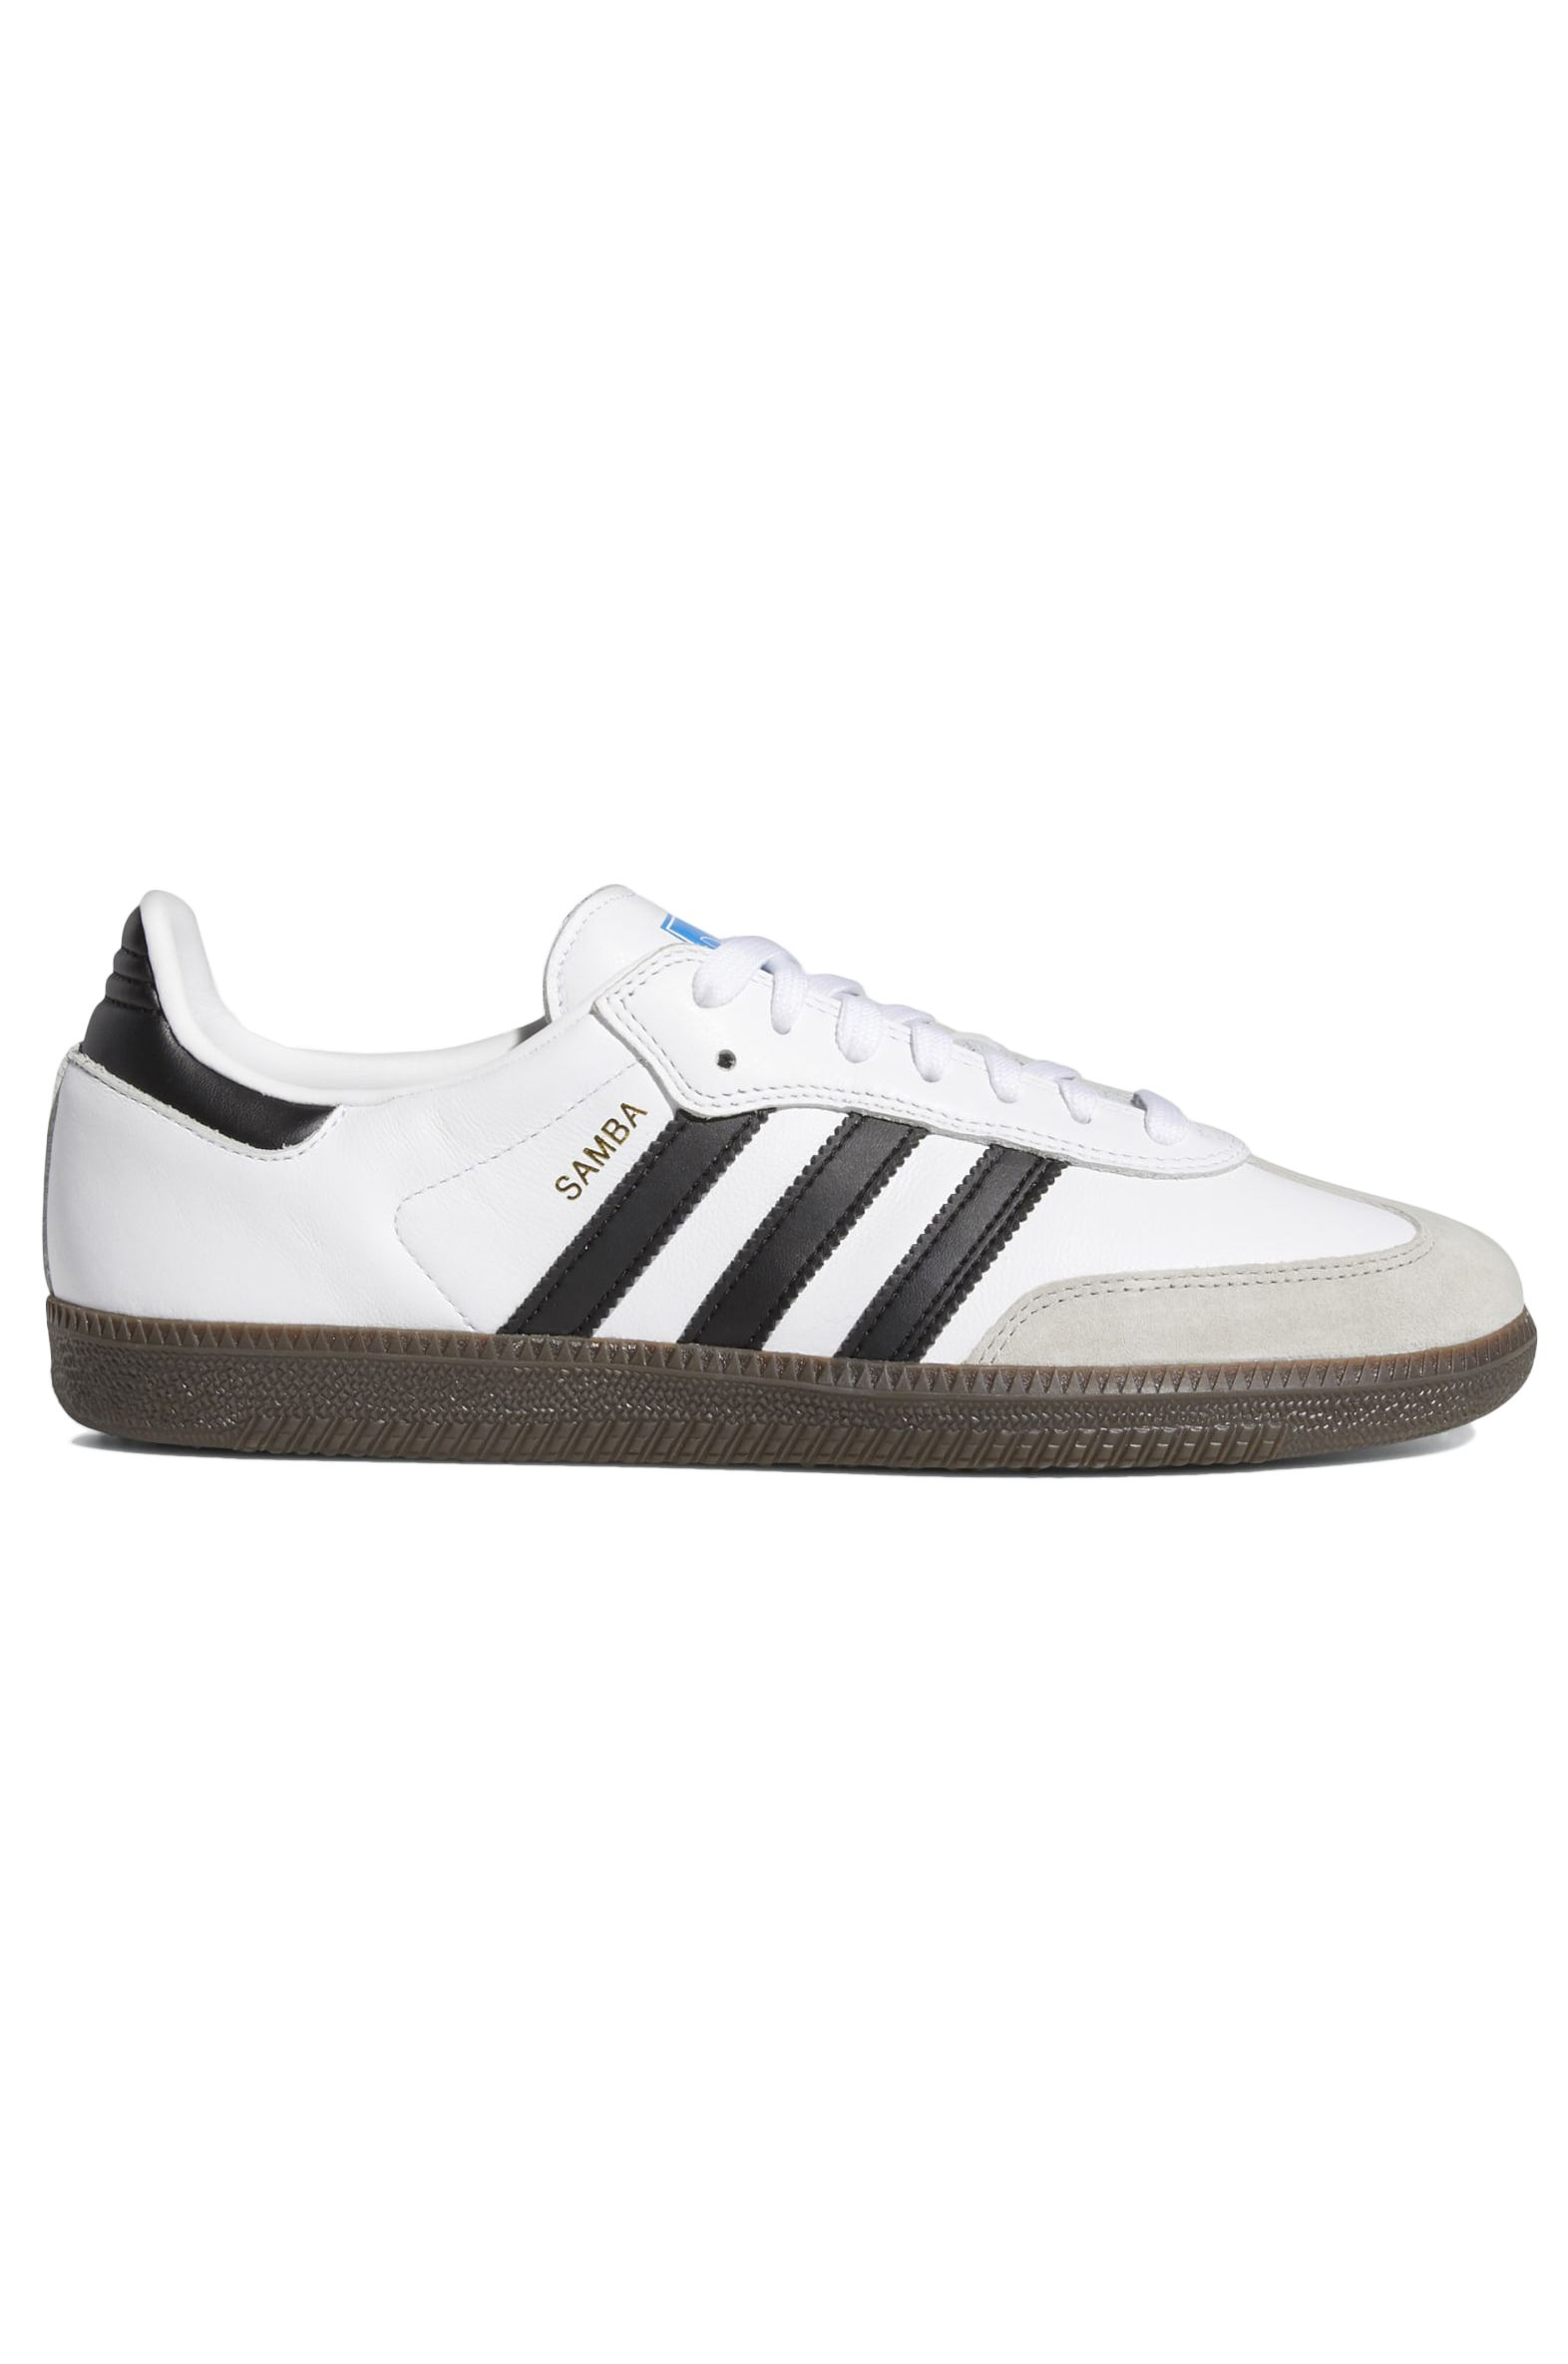 Adidas Shoes SAMBA ADV Ftwwht/Cblack/Gum5